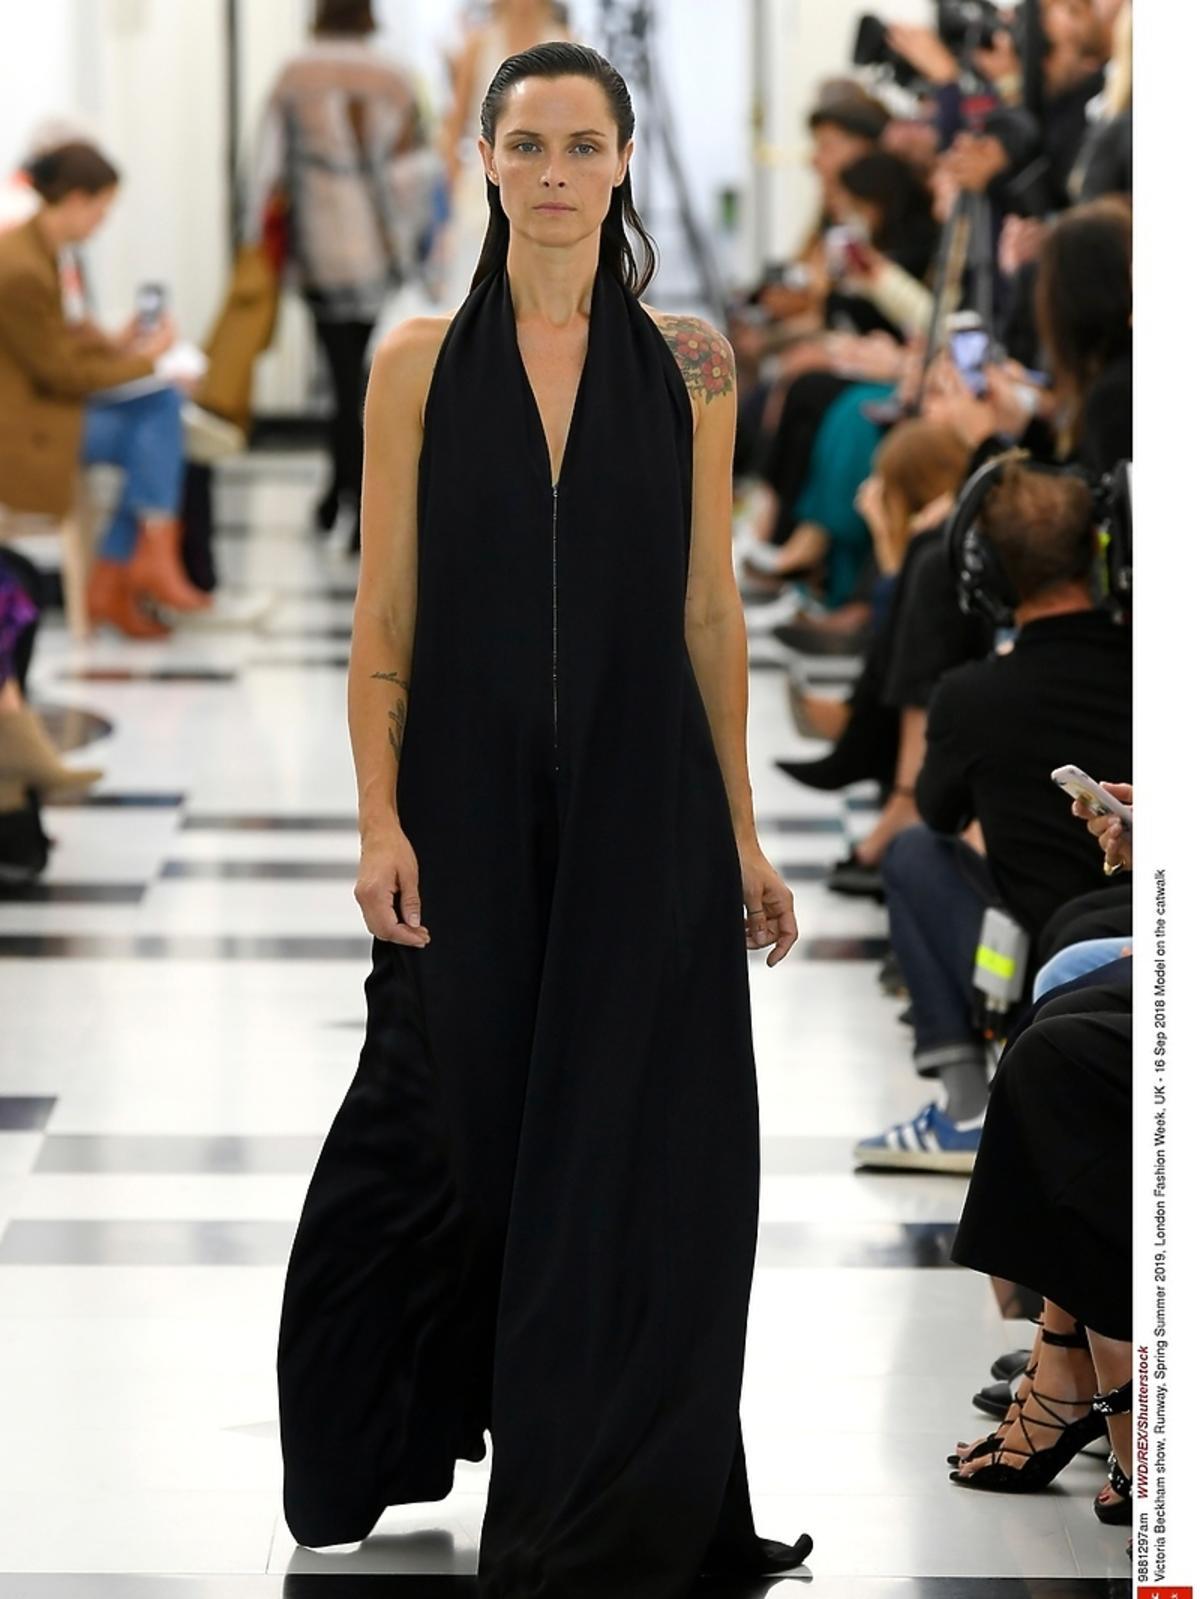 Pokaz Victorii Beckham na London Fashion Week